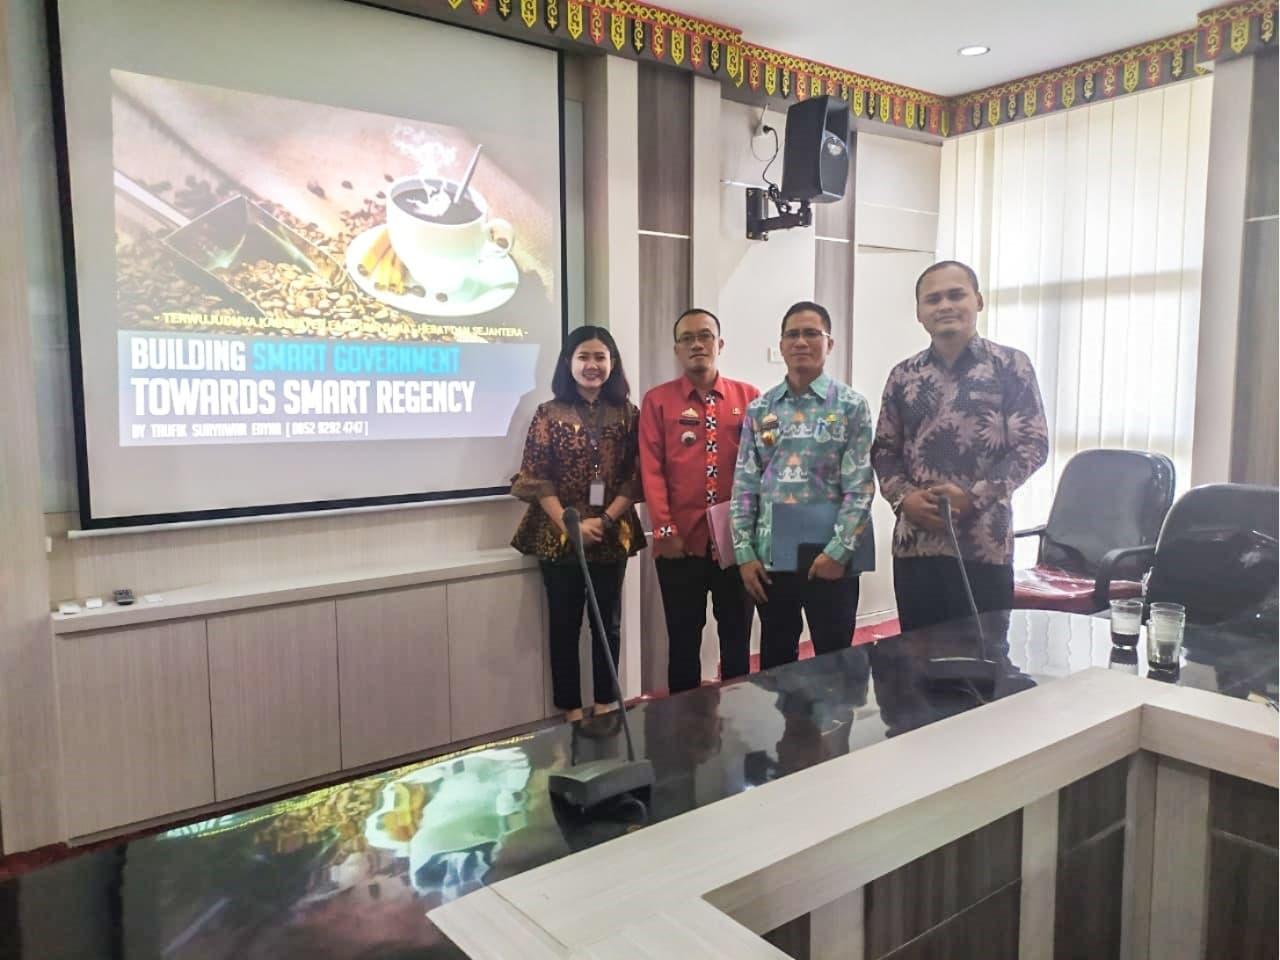 Kabupaten Lampung Barat Mulai Persiapkan Rancangan Smart City